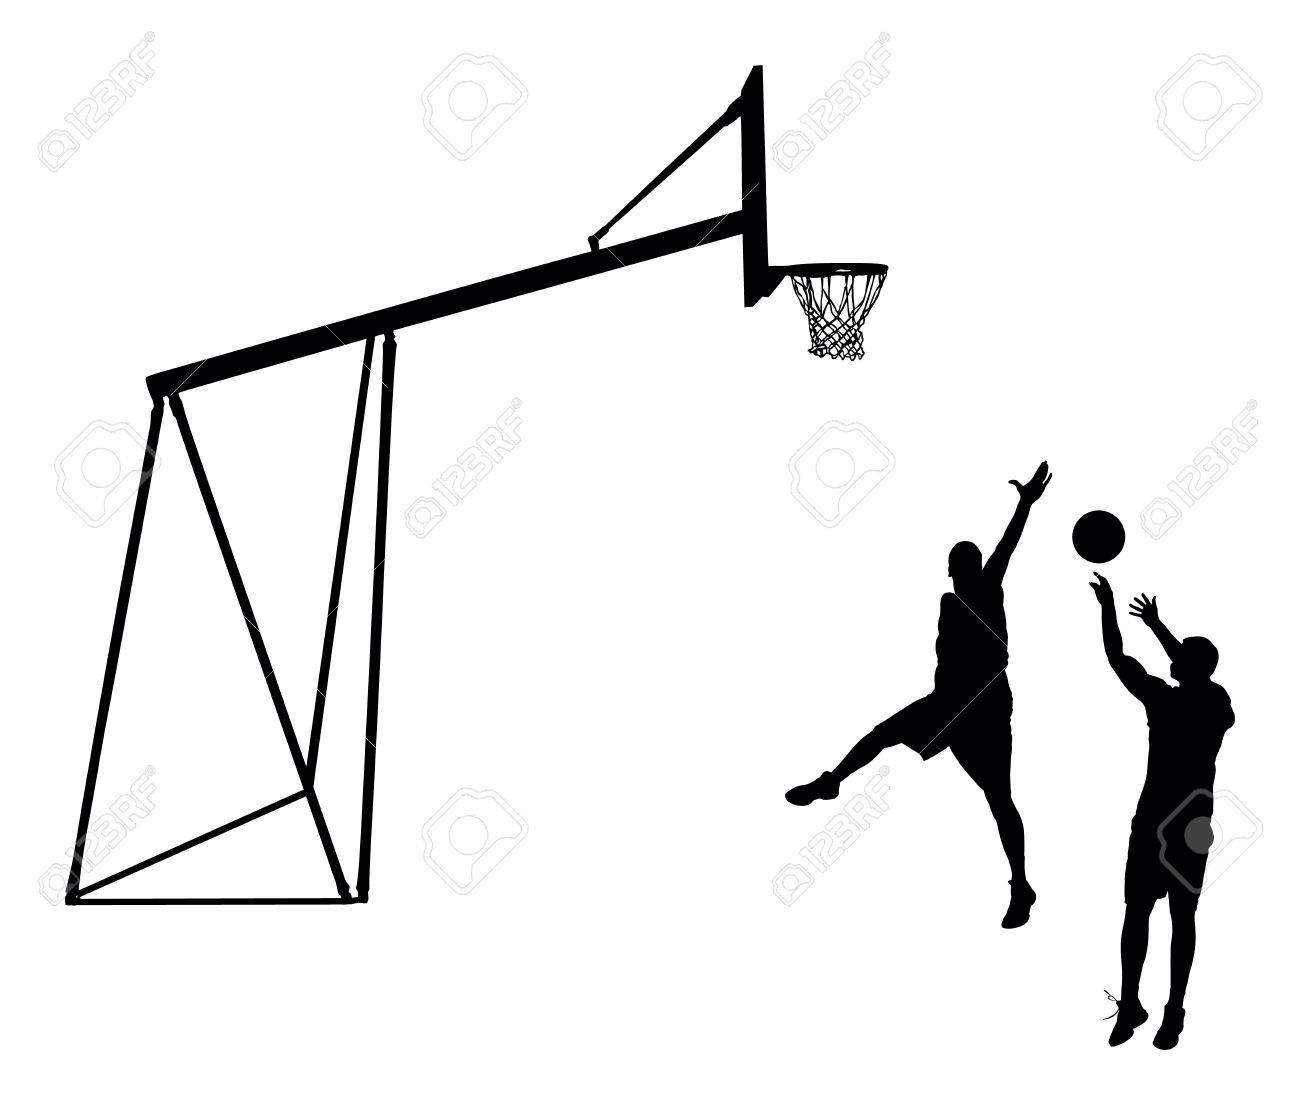 basketball players black silhouette vector illustration isolated rh 123rf com basketball team silhouette vector playing basketball silhouette vector